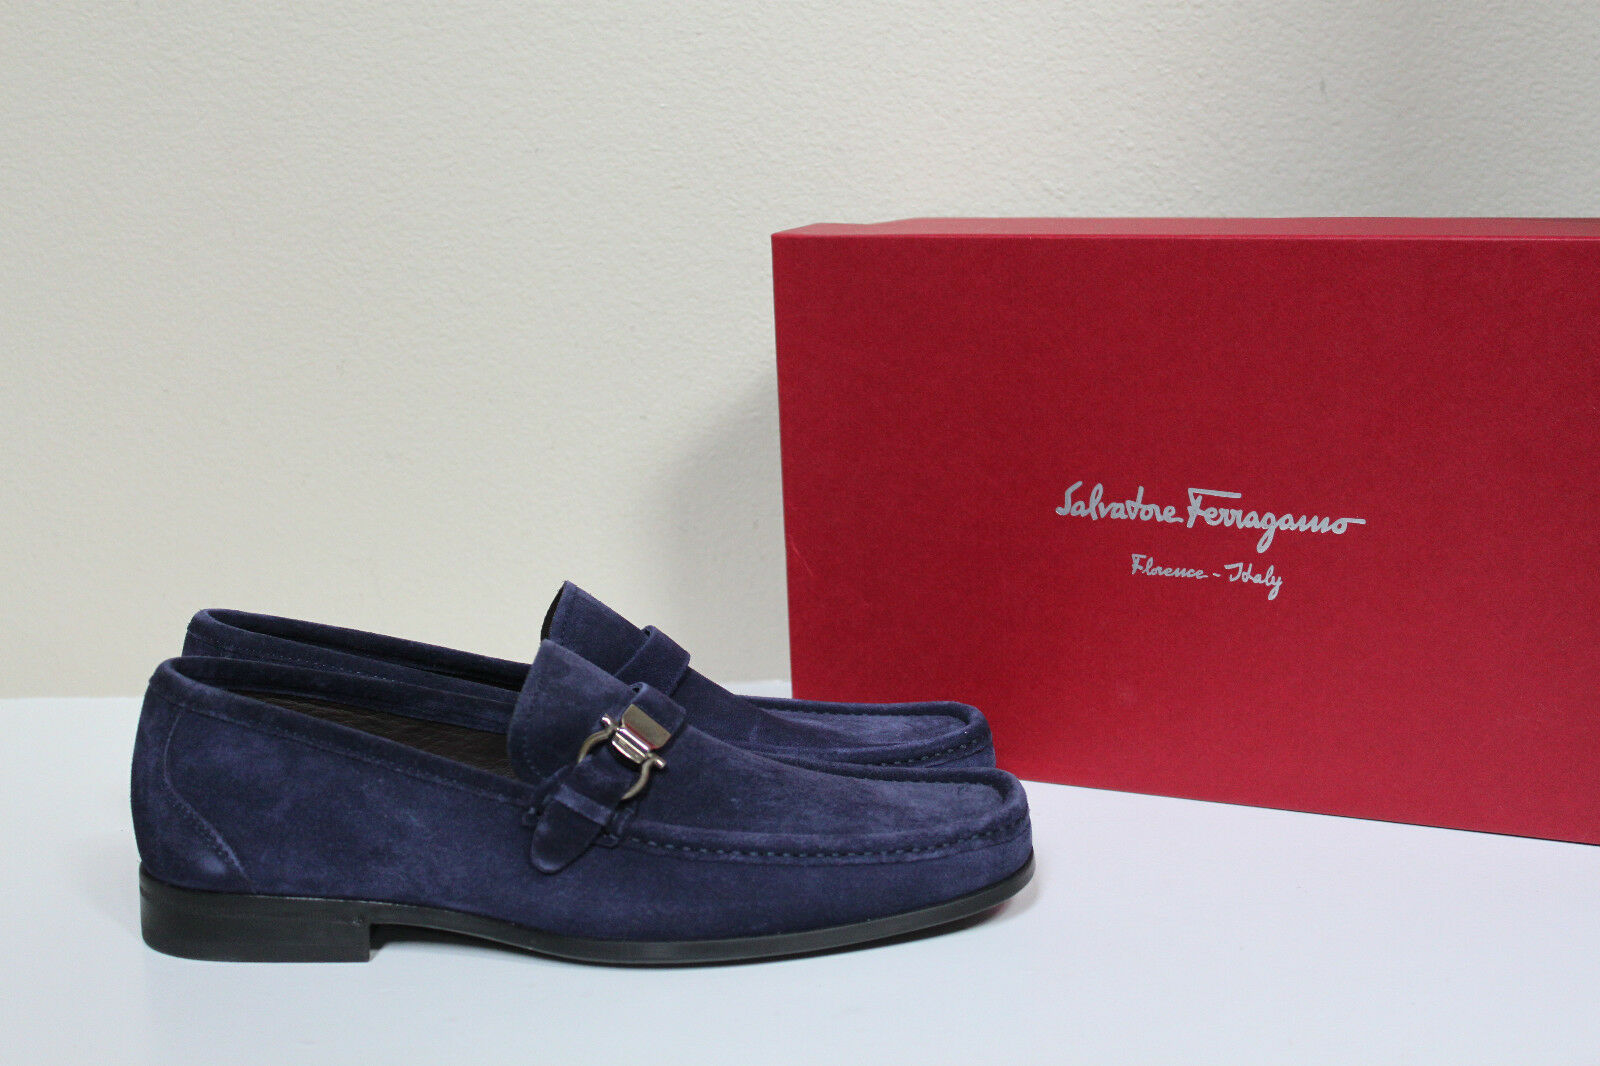 New sz 9 9 9 EE 2E SALVATORE FERRAGAMO Muller Logo Navy bluee Suede Loafers Men shoes a753f6